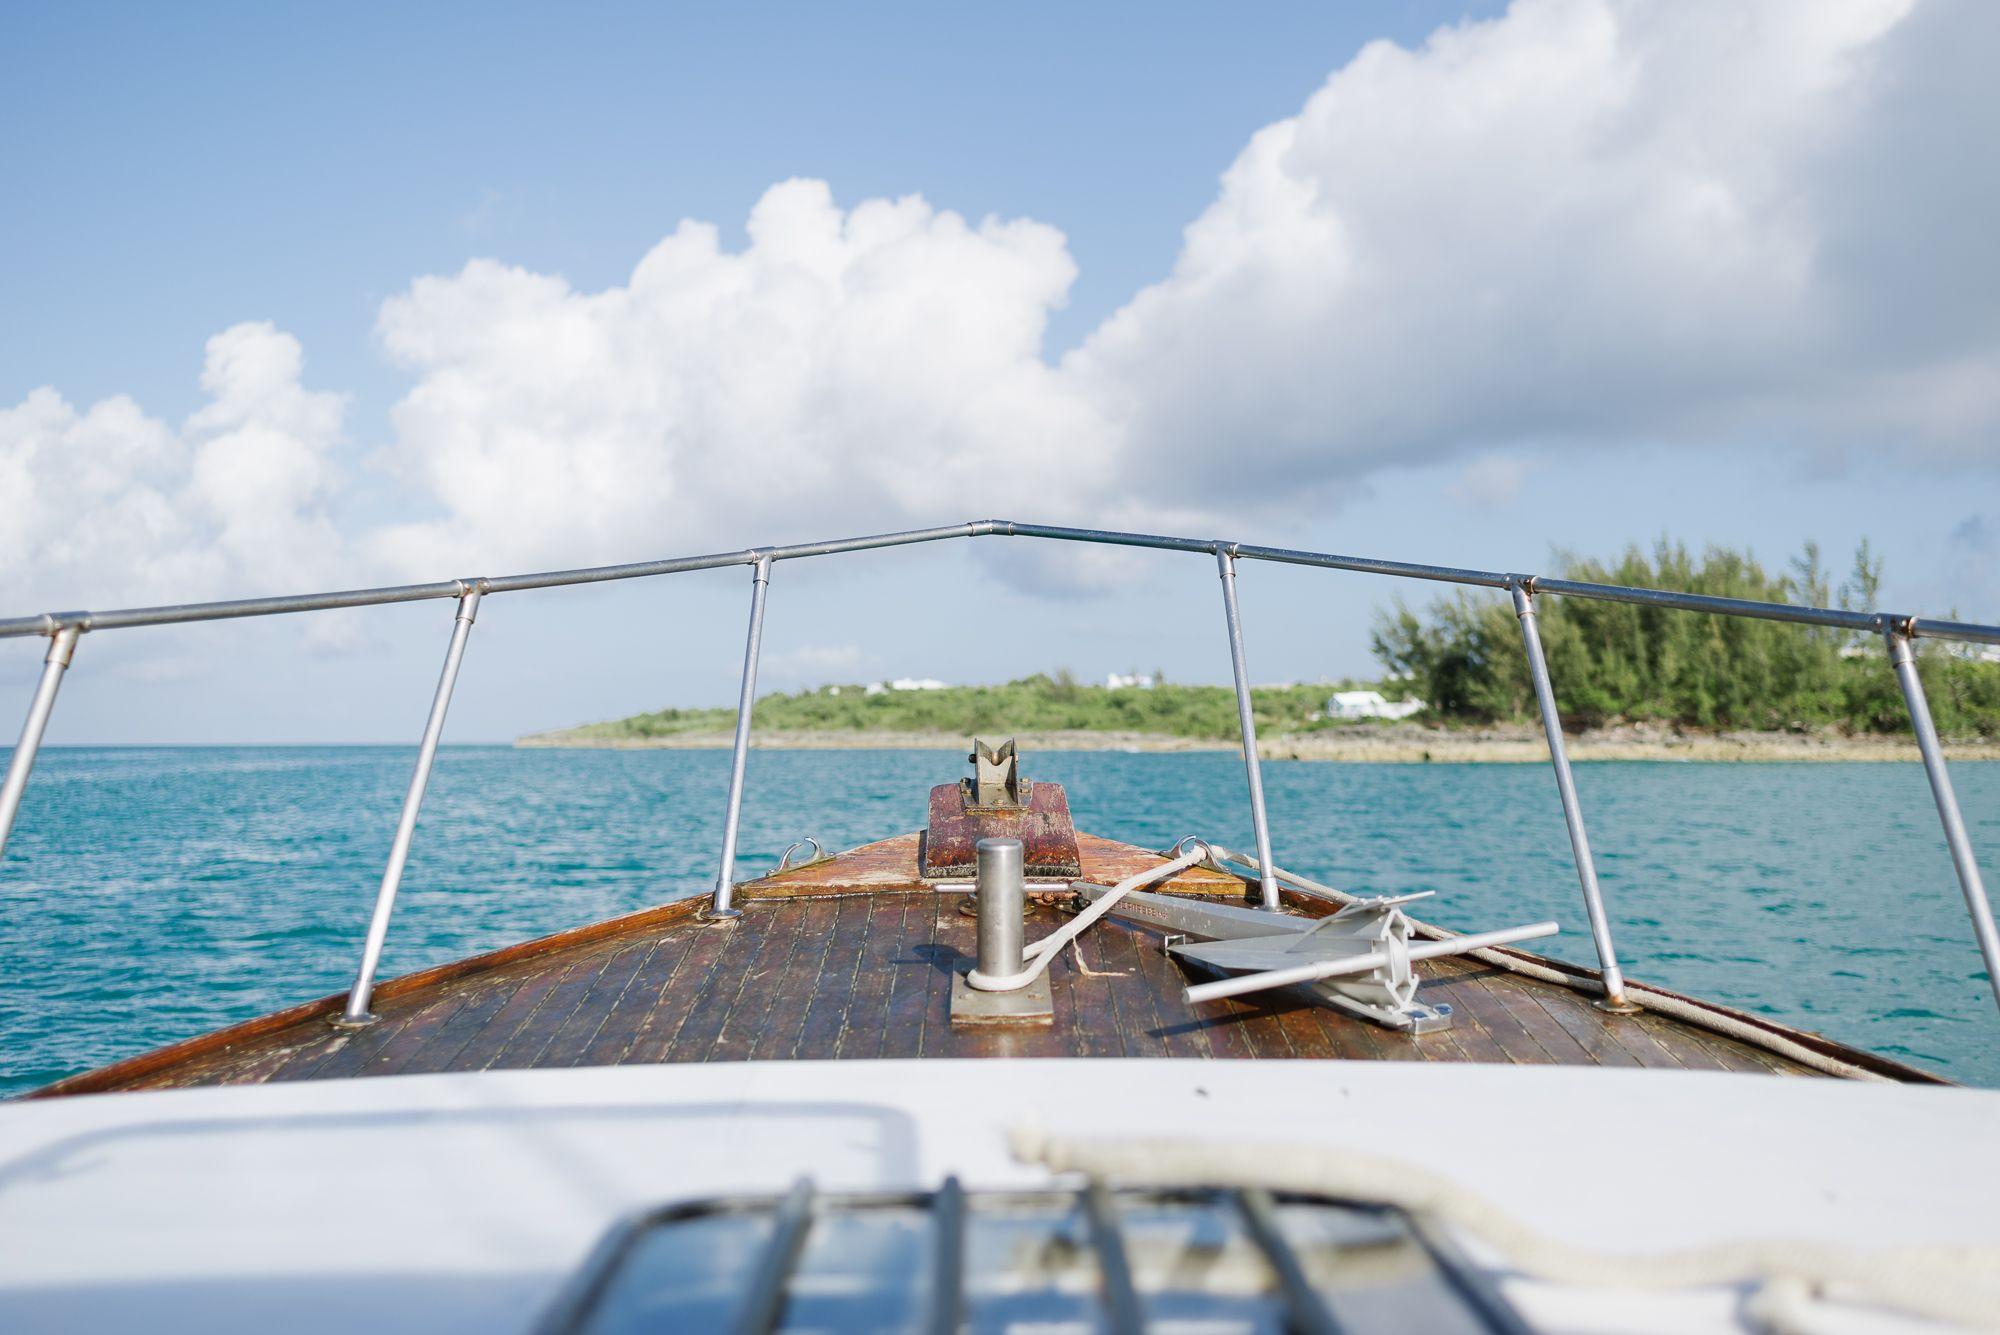 Visit Bermuda, St. George's Bermuda Travel Guide, Vacation in Bermuda, Tobacco Bay Bermuda